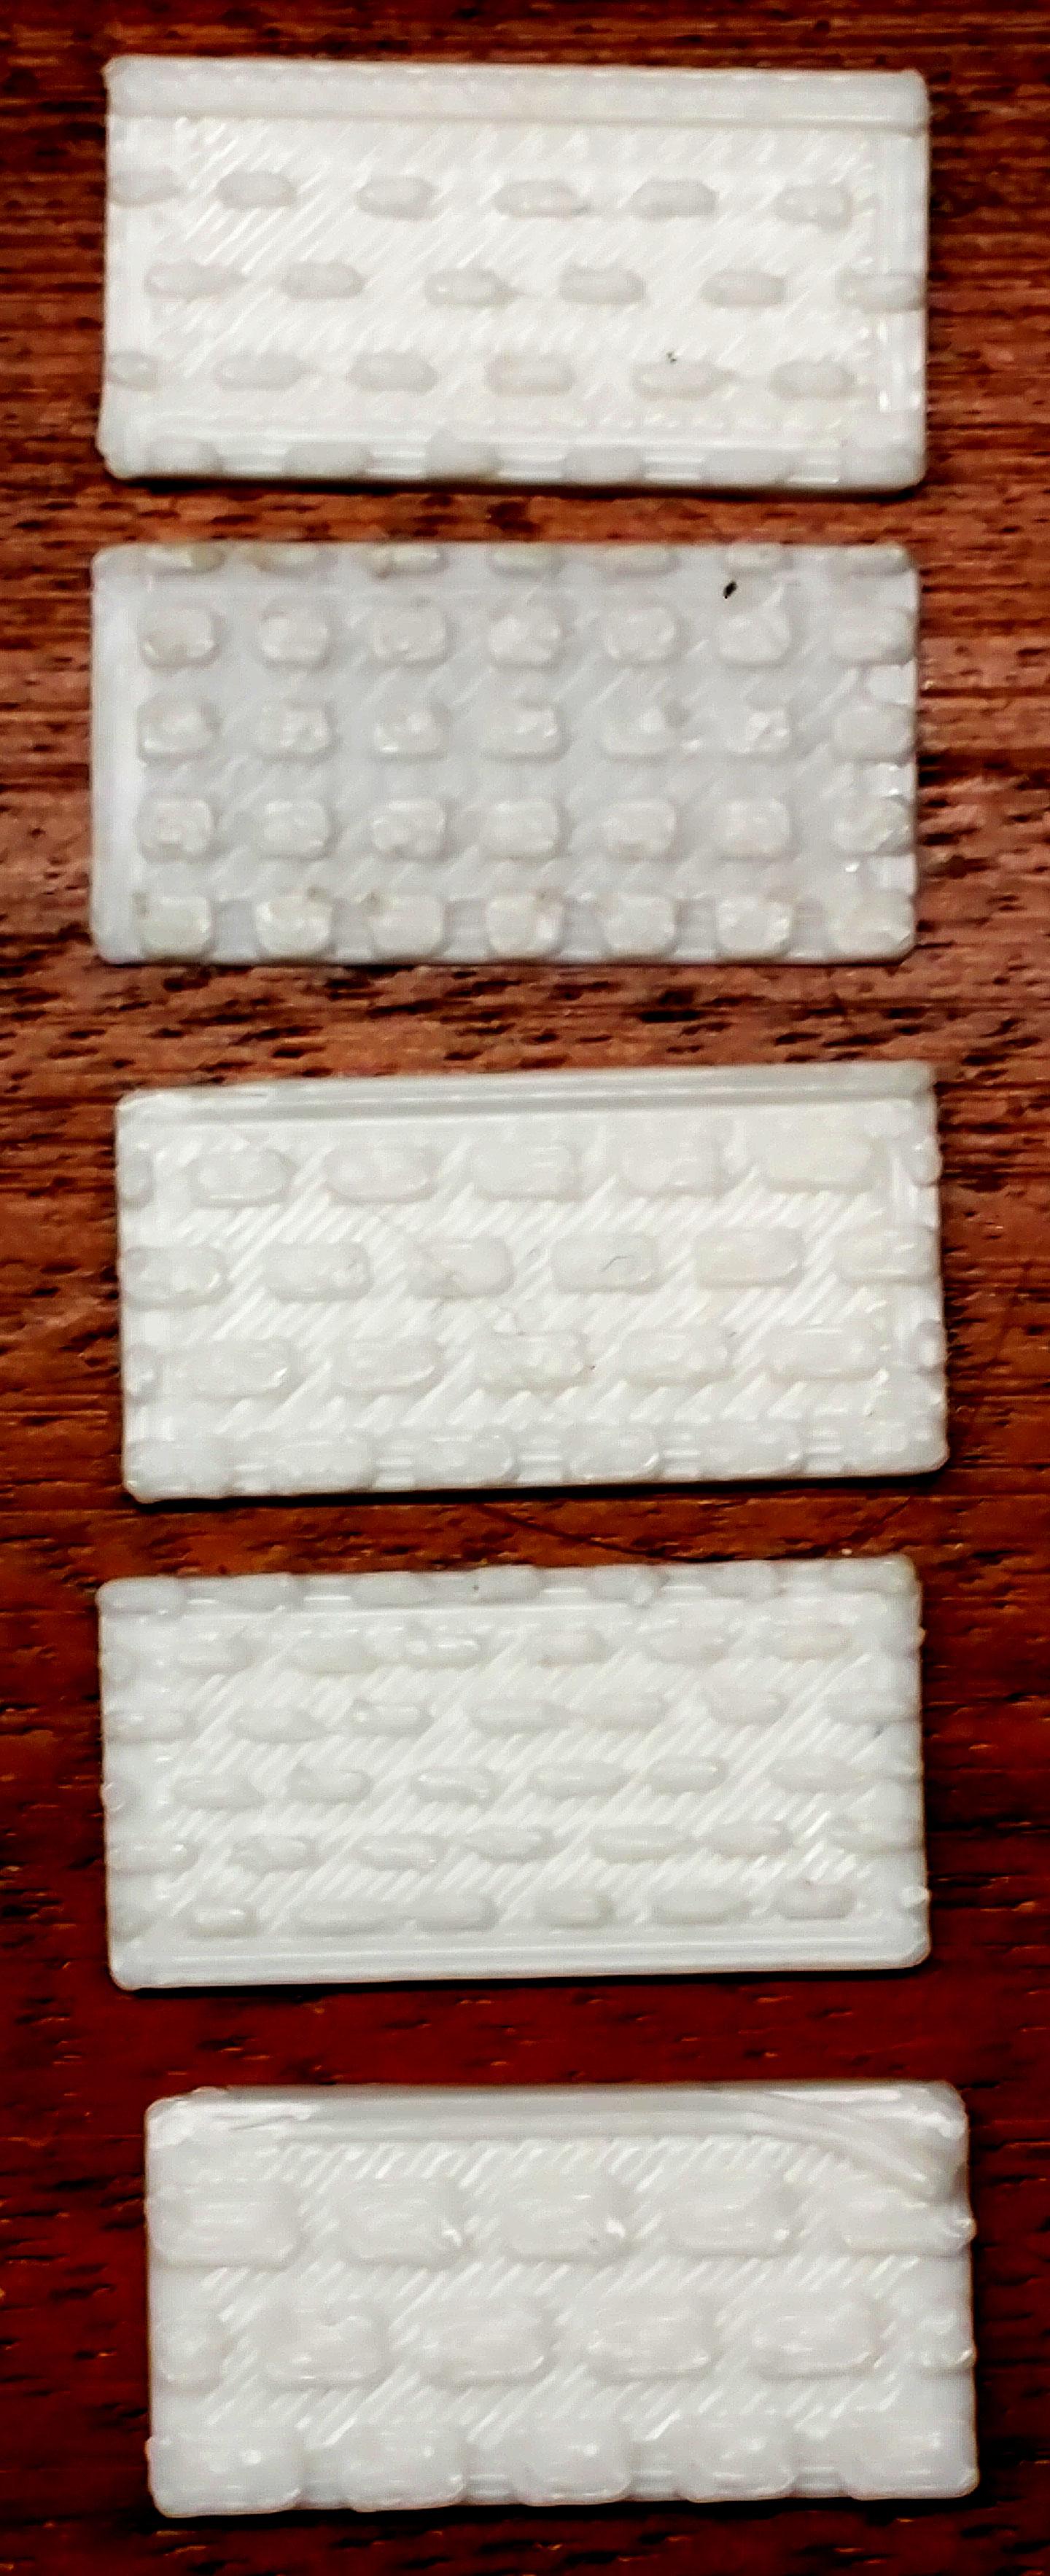 Brick texture samples